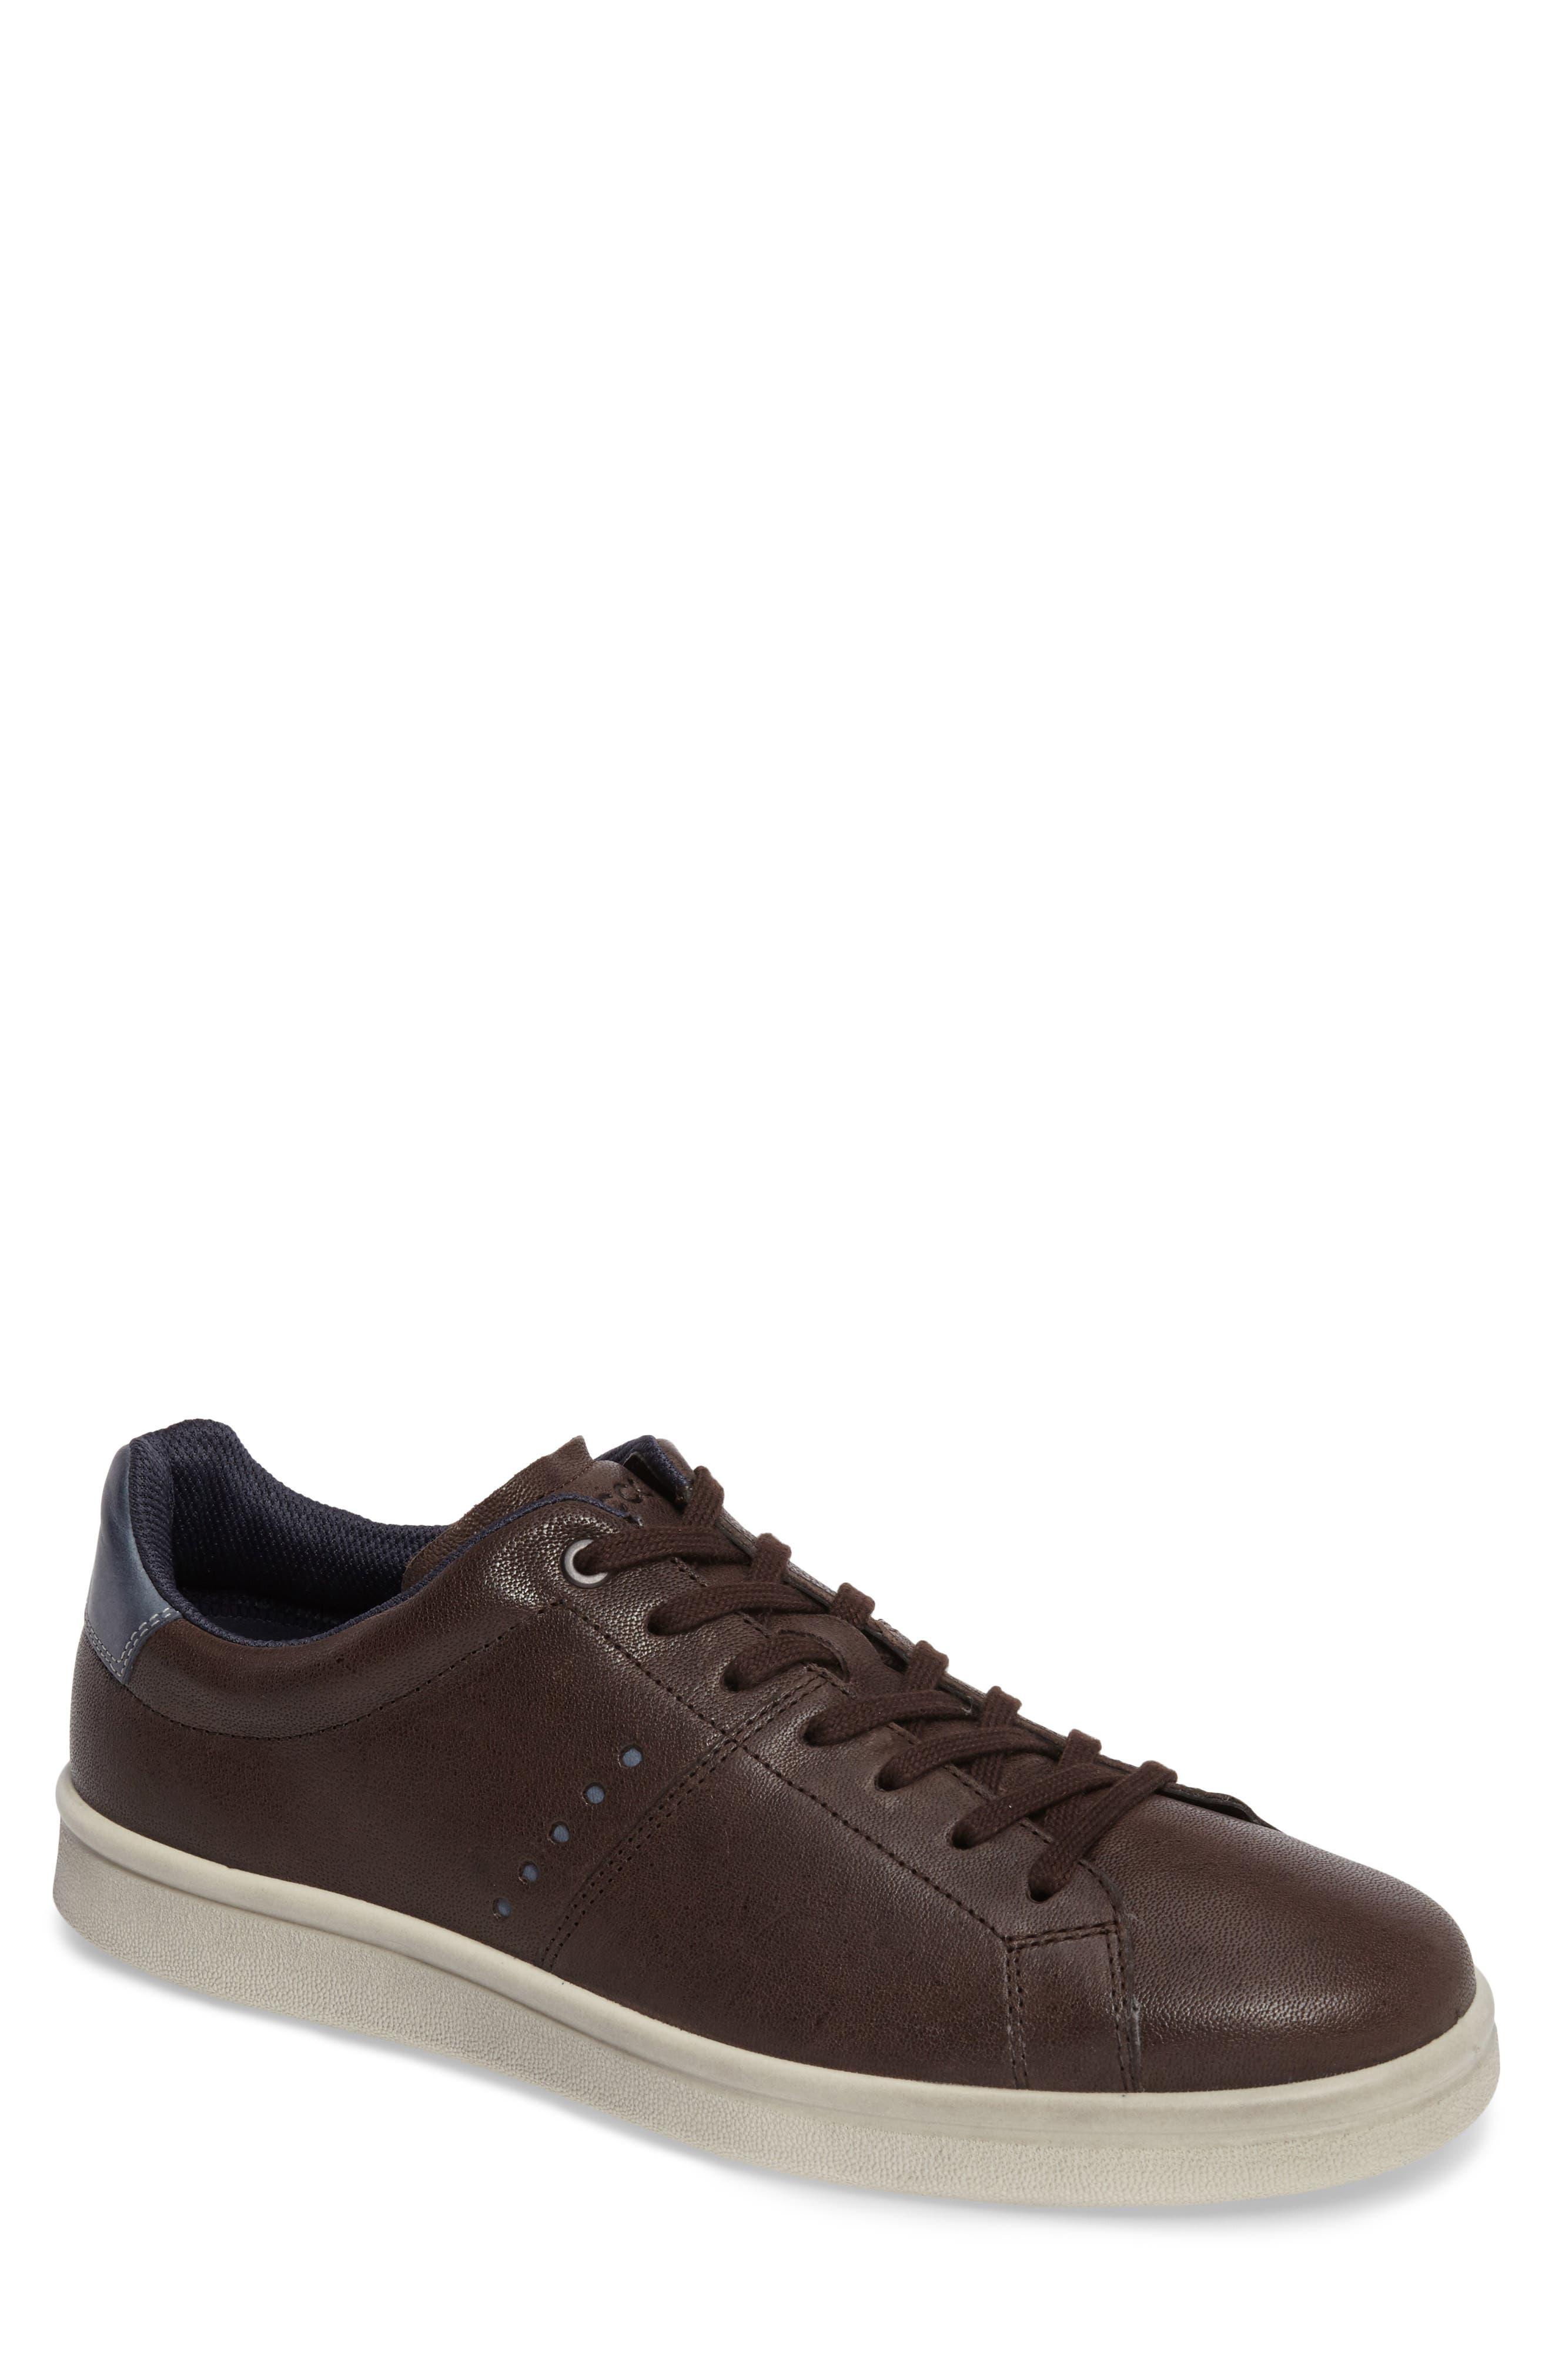 Main Image - ECCO Kallum Sneaker (Men)